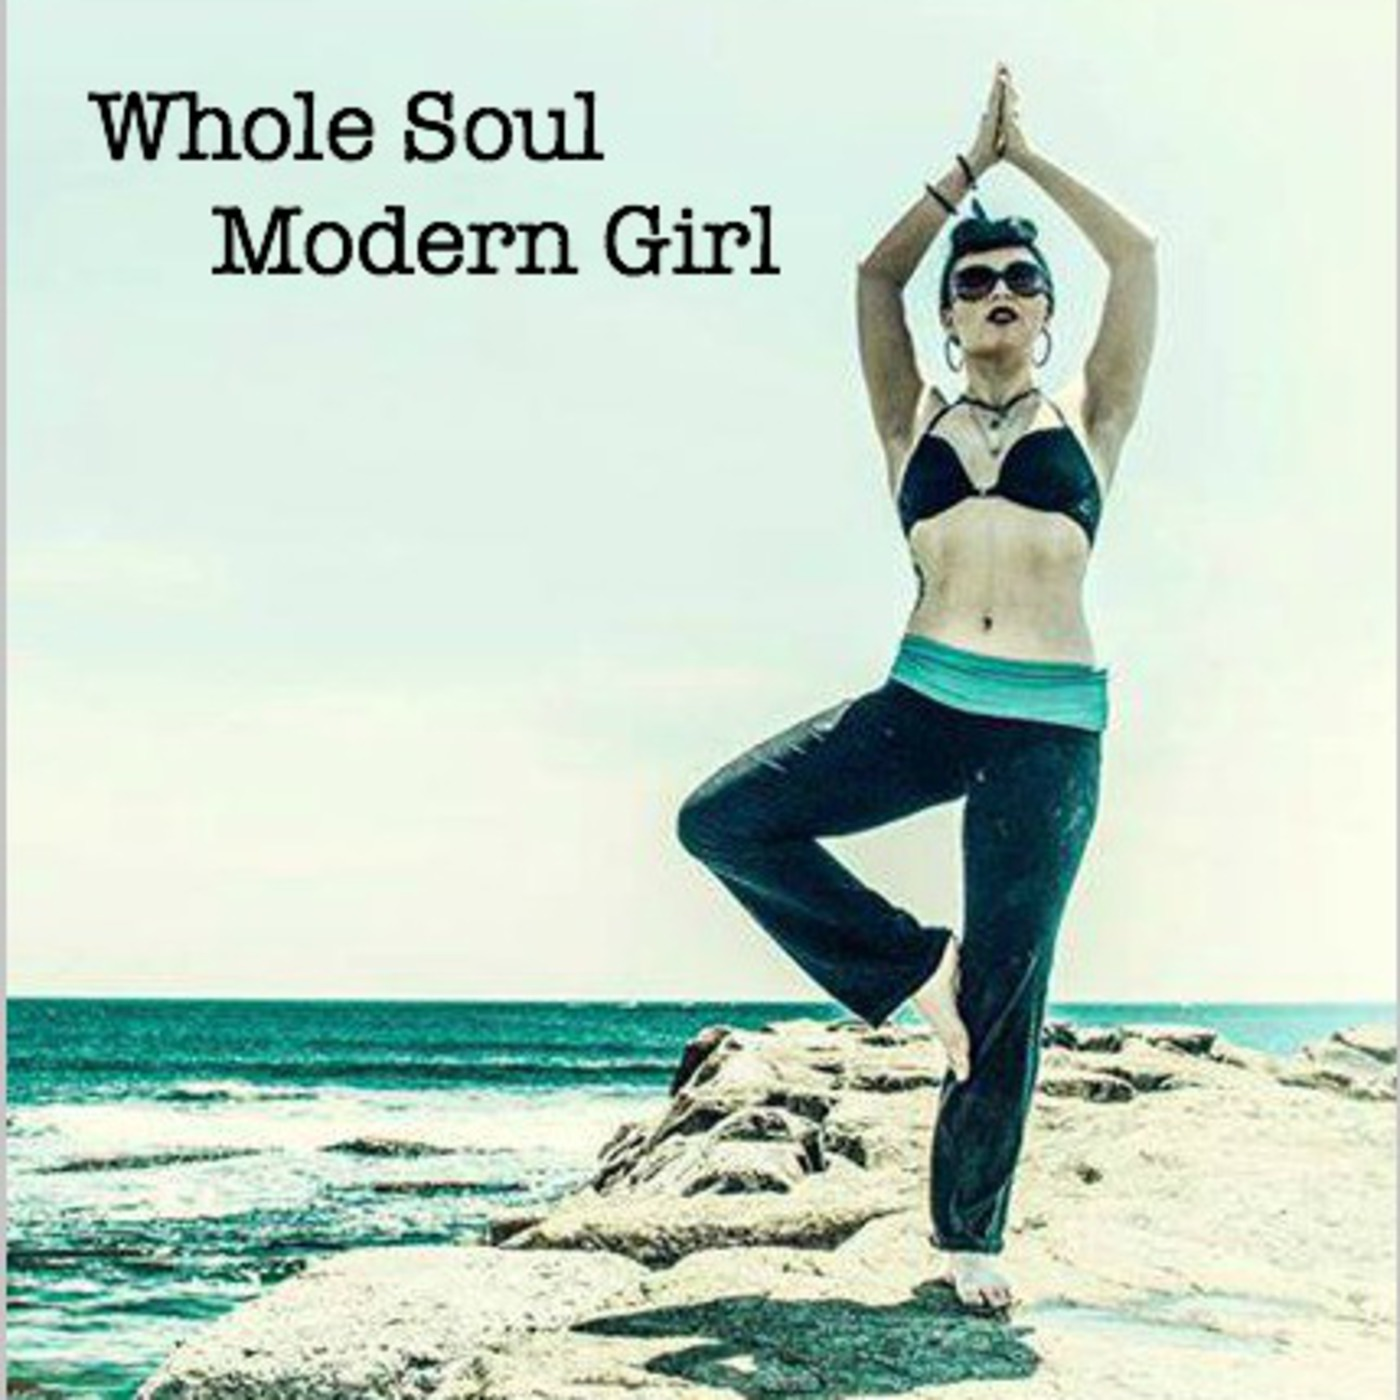 Whole Soul Modern Girl